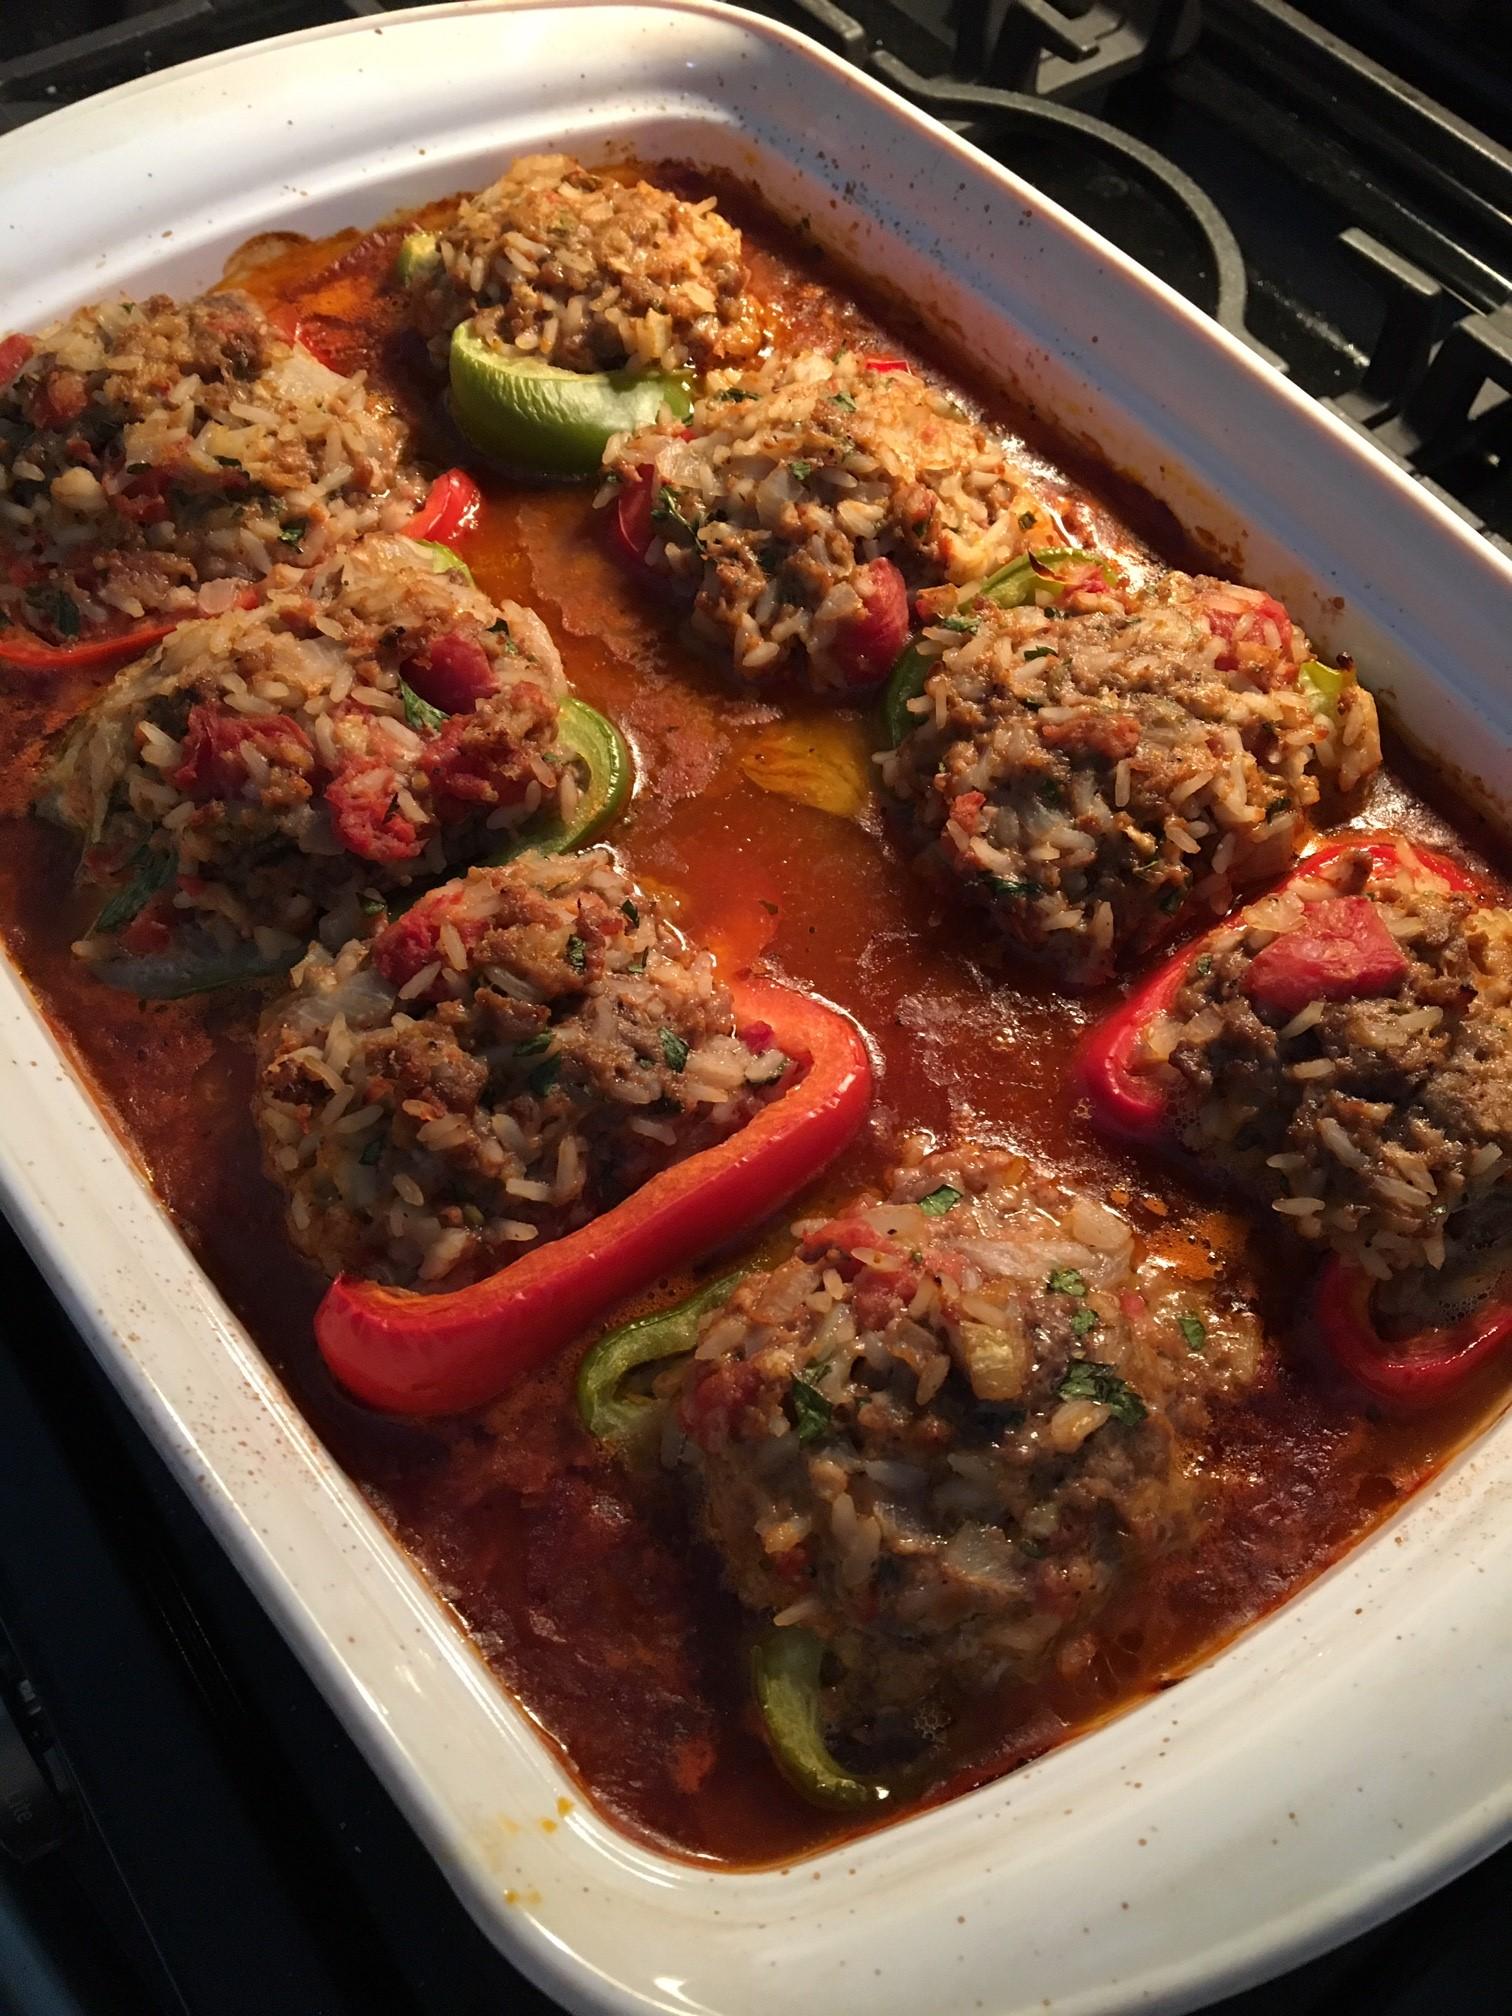 Chef John's Stuffed Peppers dat1guy